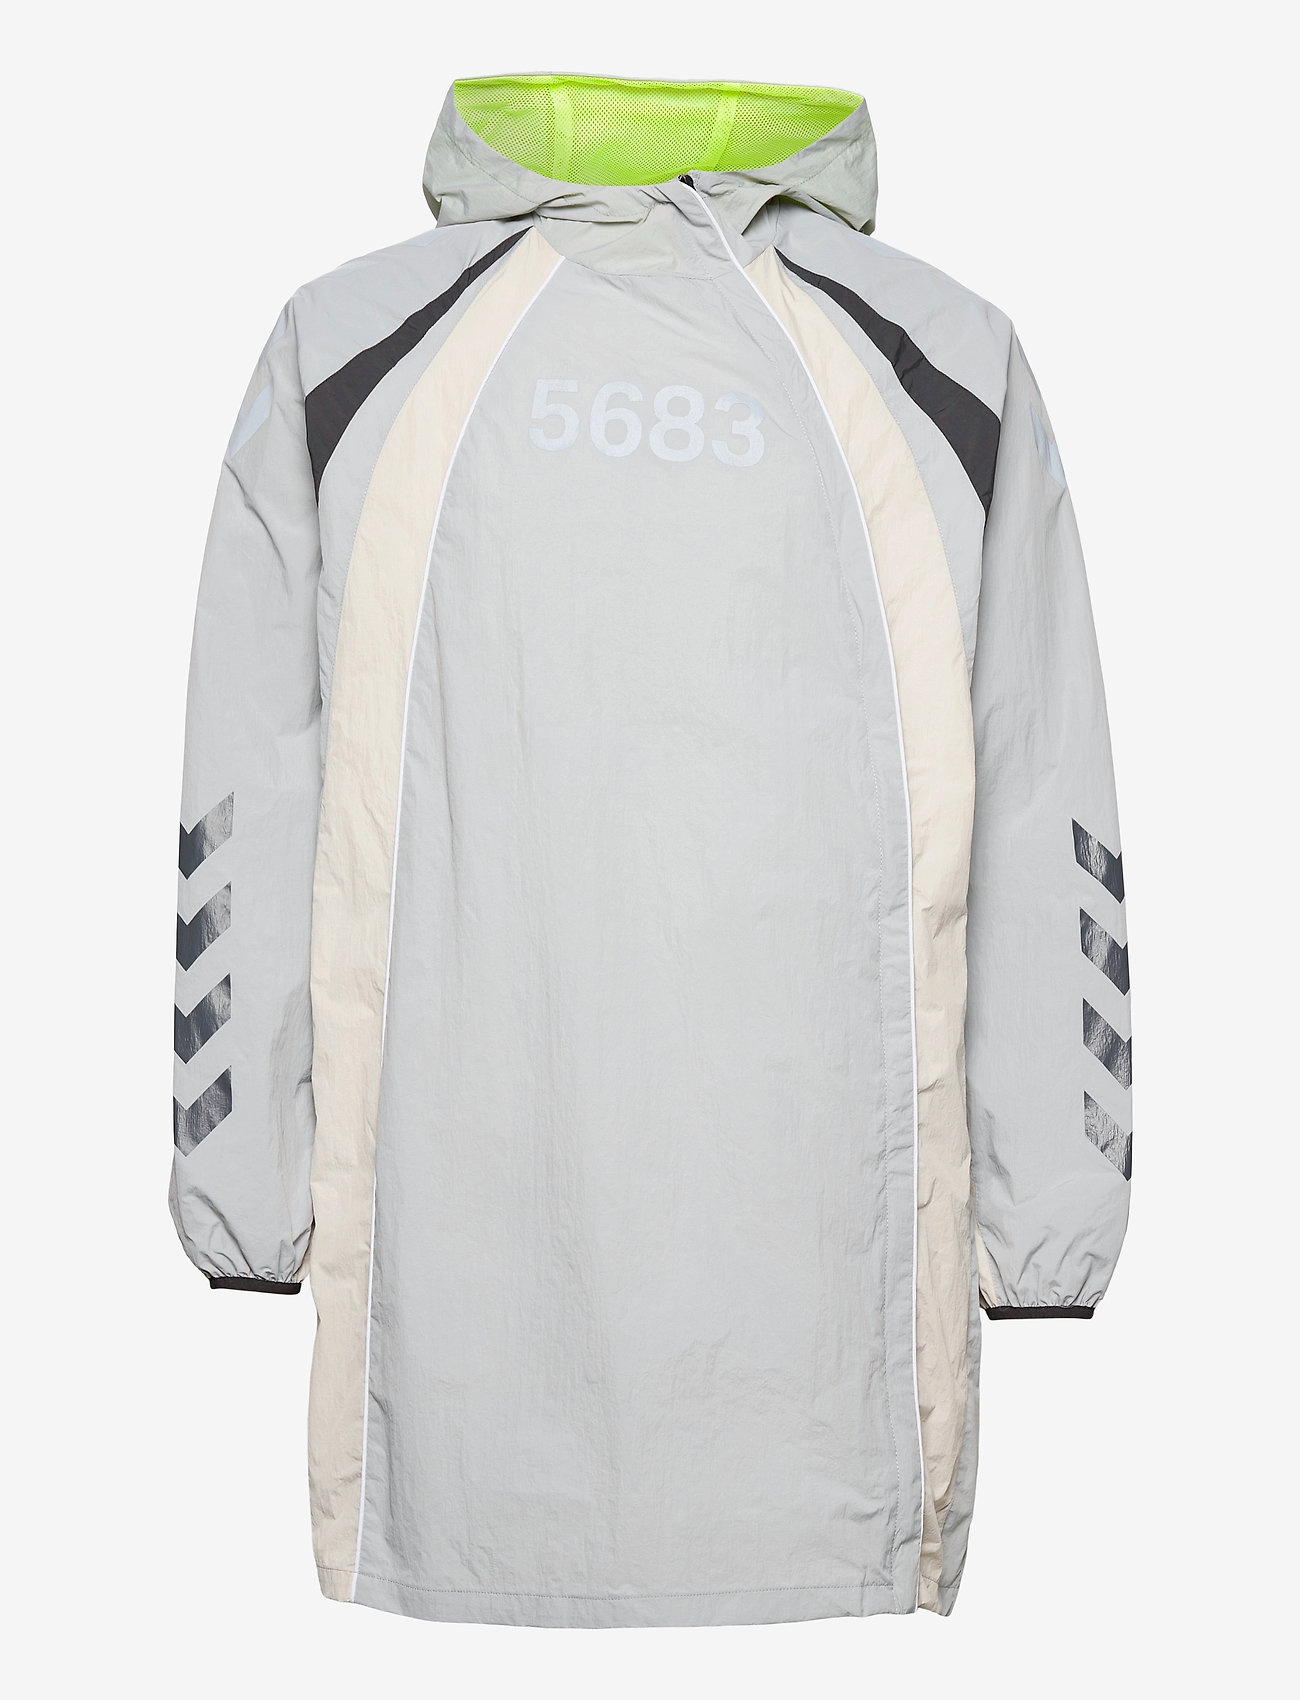 Hummel - hmlWILLY LONG JACKET - sports jackets - harbor mist - 1